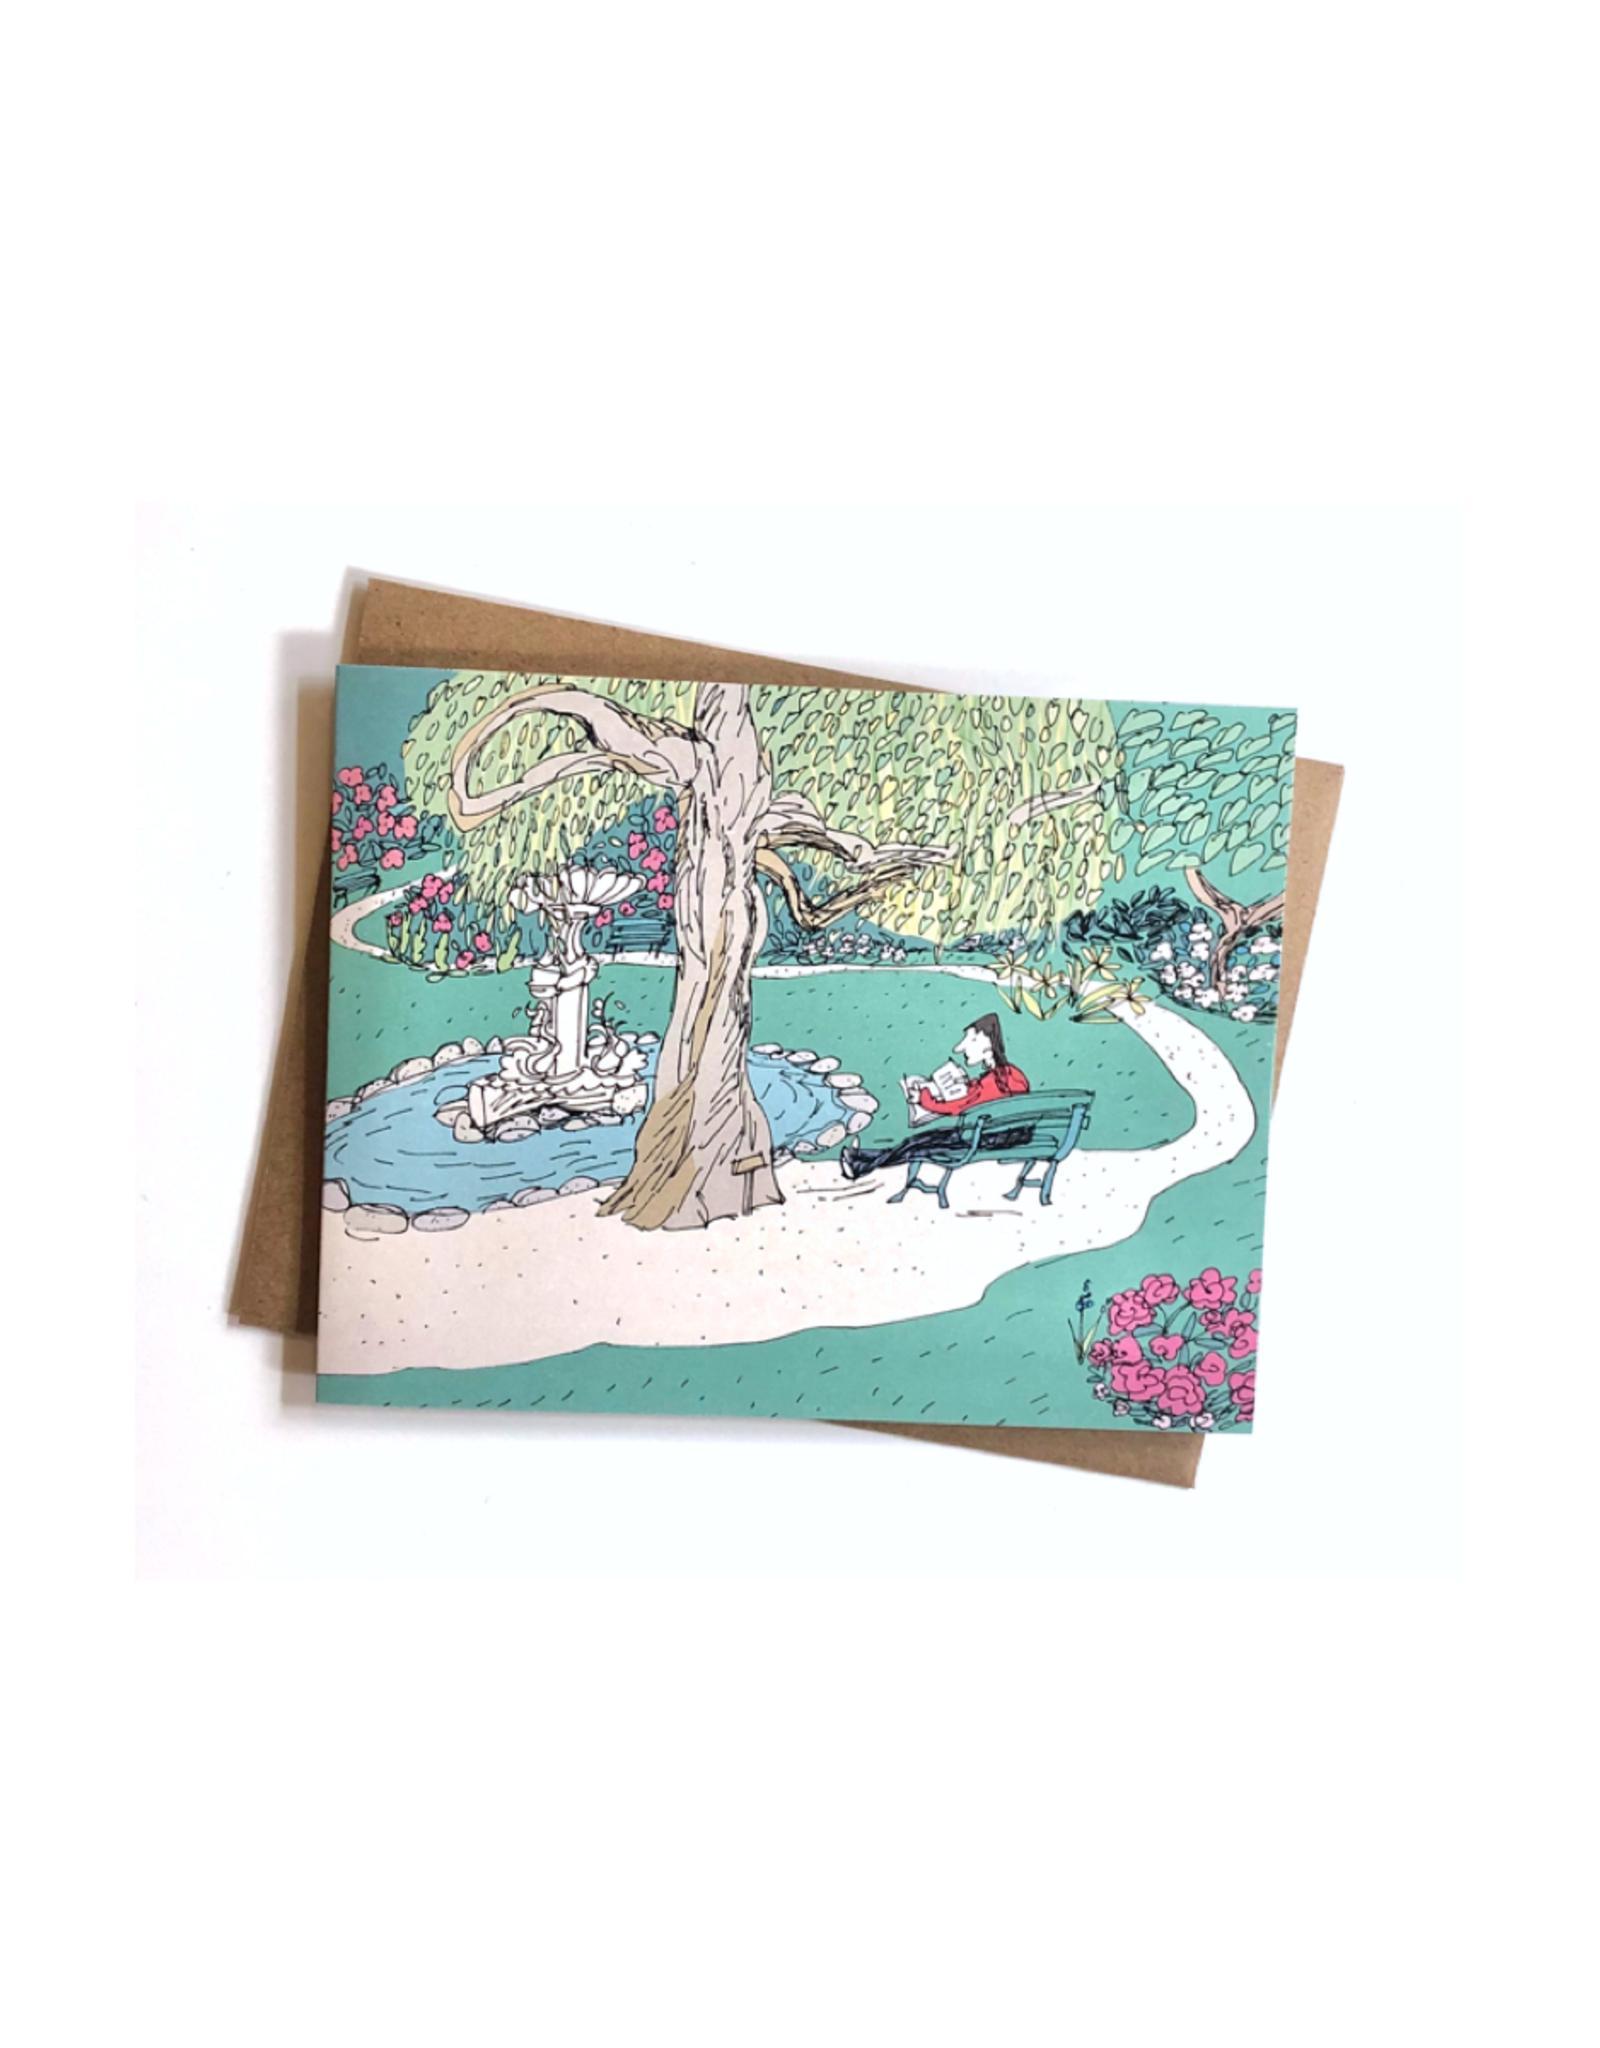 "Emma Fitzgerald - Card/Reading in the Public Gardens, 4.25 x 5.5"""